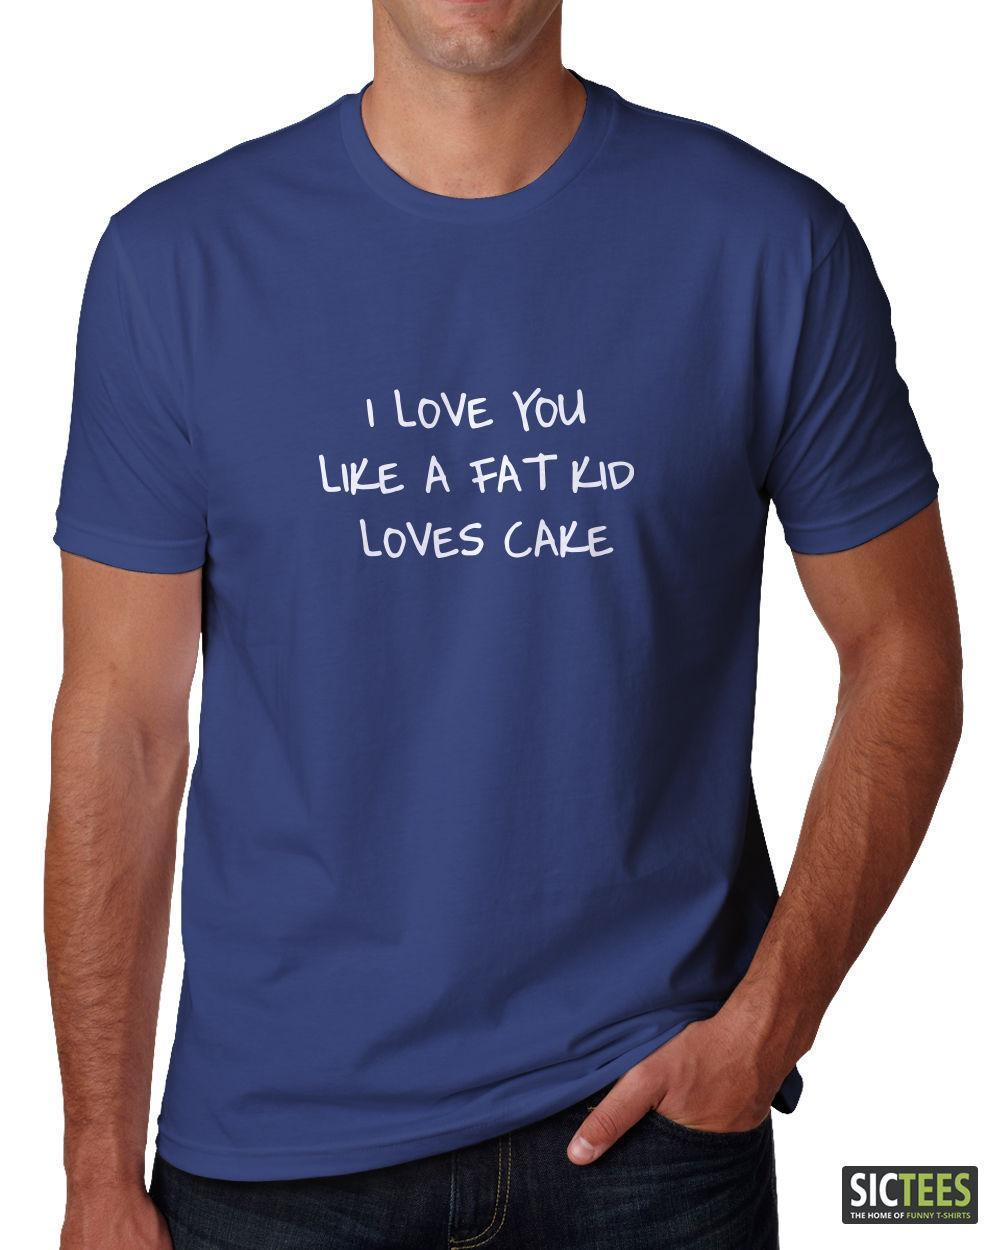 21b7e866 Cute Love Men'S Ladies T Shirt Gift I LOVE YOU Funny Husband Wife Boyfriend  Buy Cool T Shirts Funky Tee Shirts From Lefan09, $14.67| DHgate.Com